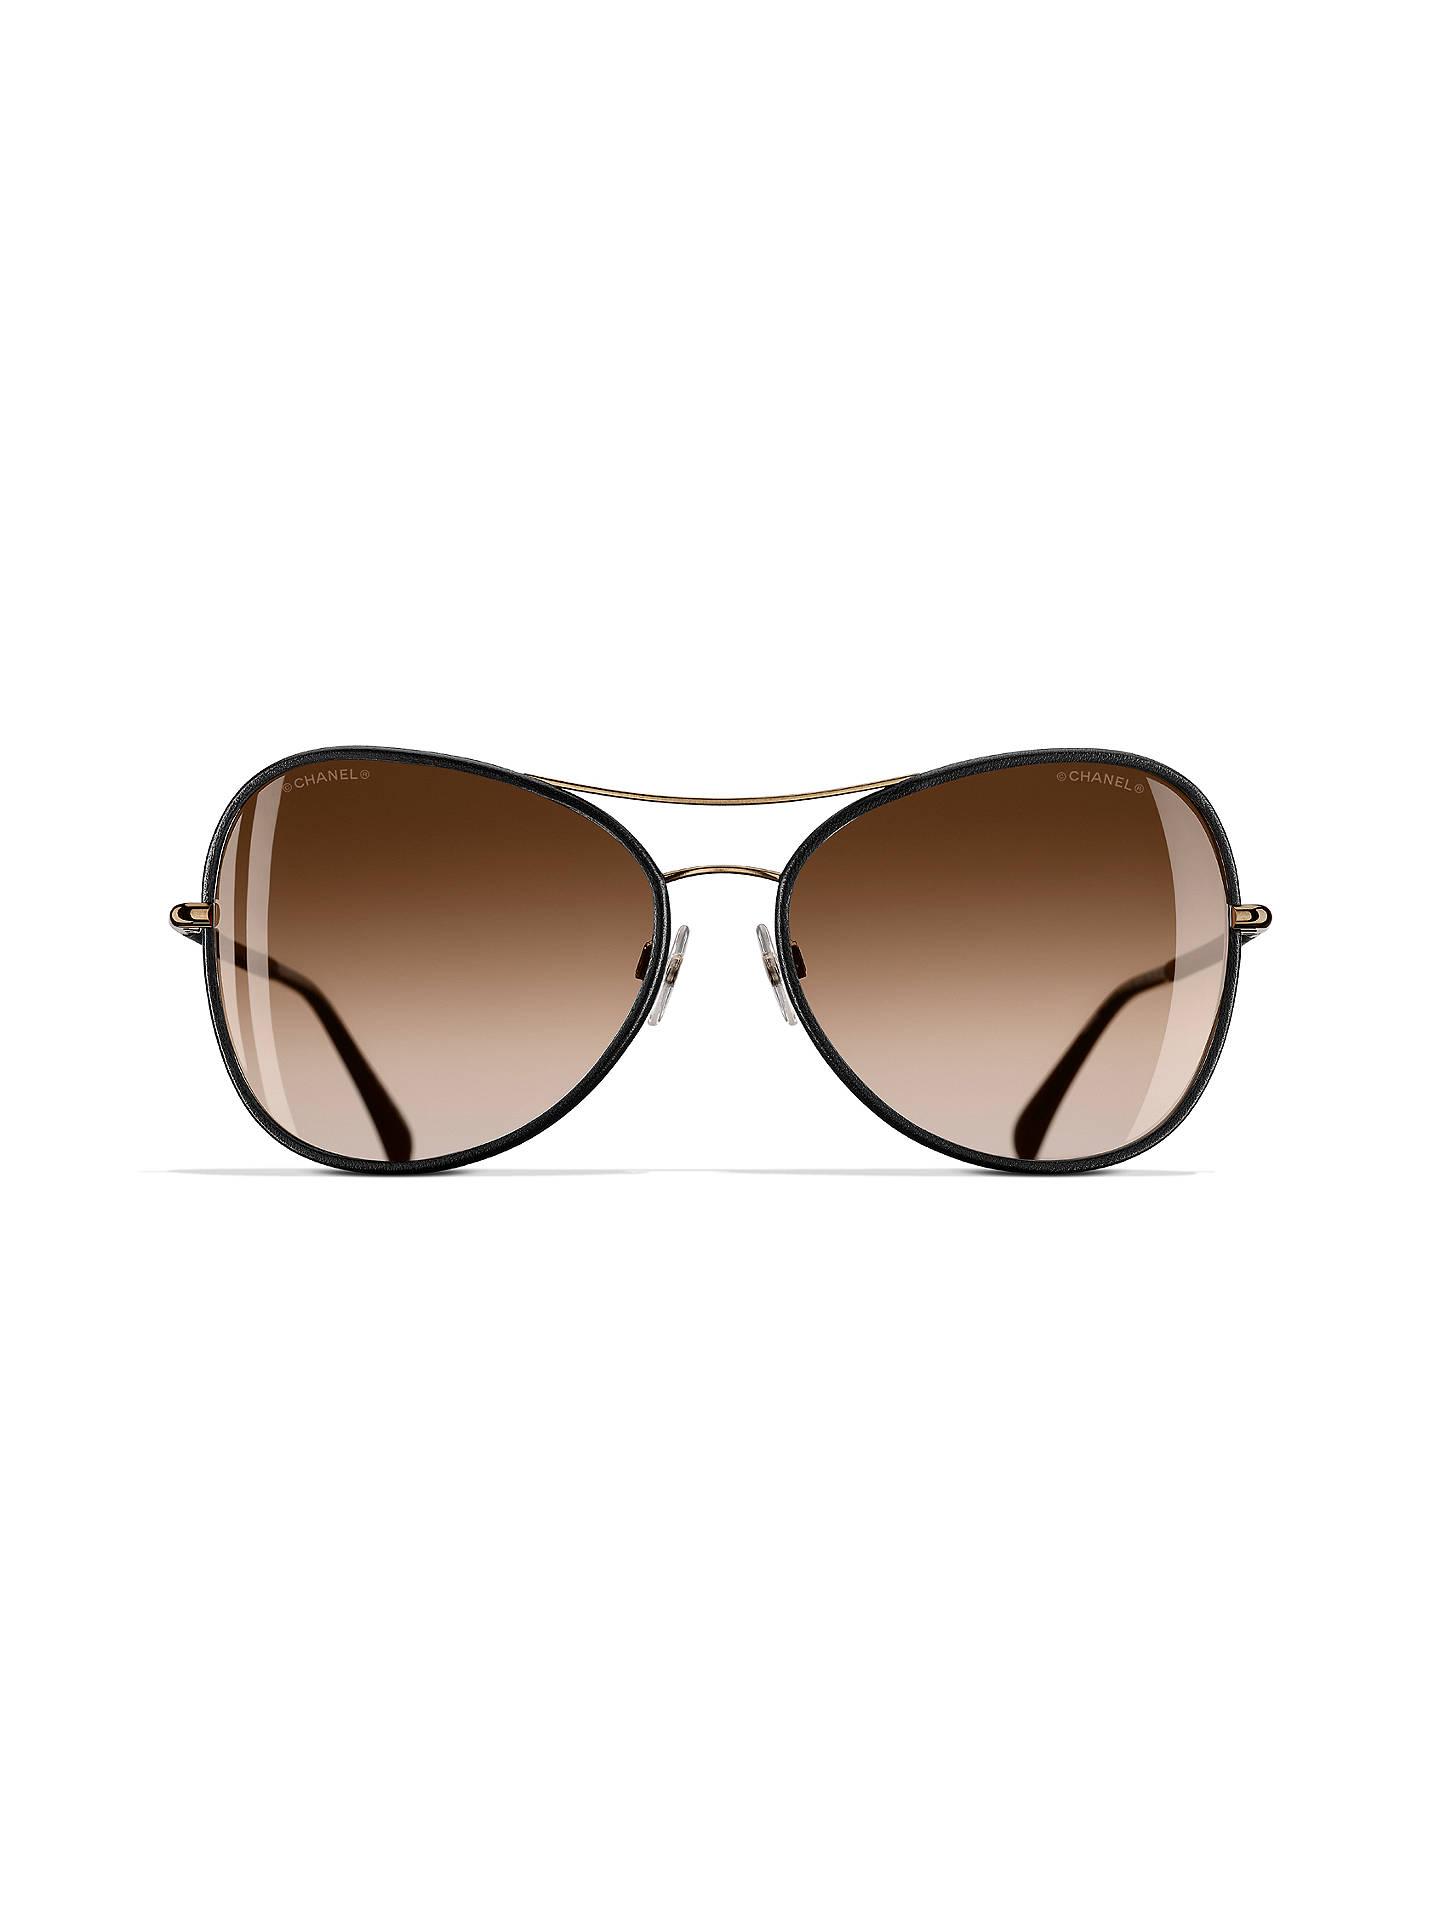 2b5c09b9d46 ... Buy CHANEL Pilot Sunglasses CH4227Q Black Gold Online at johnlewis.com  ...